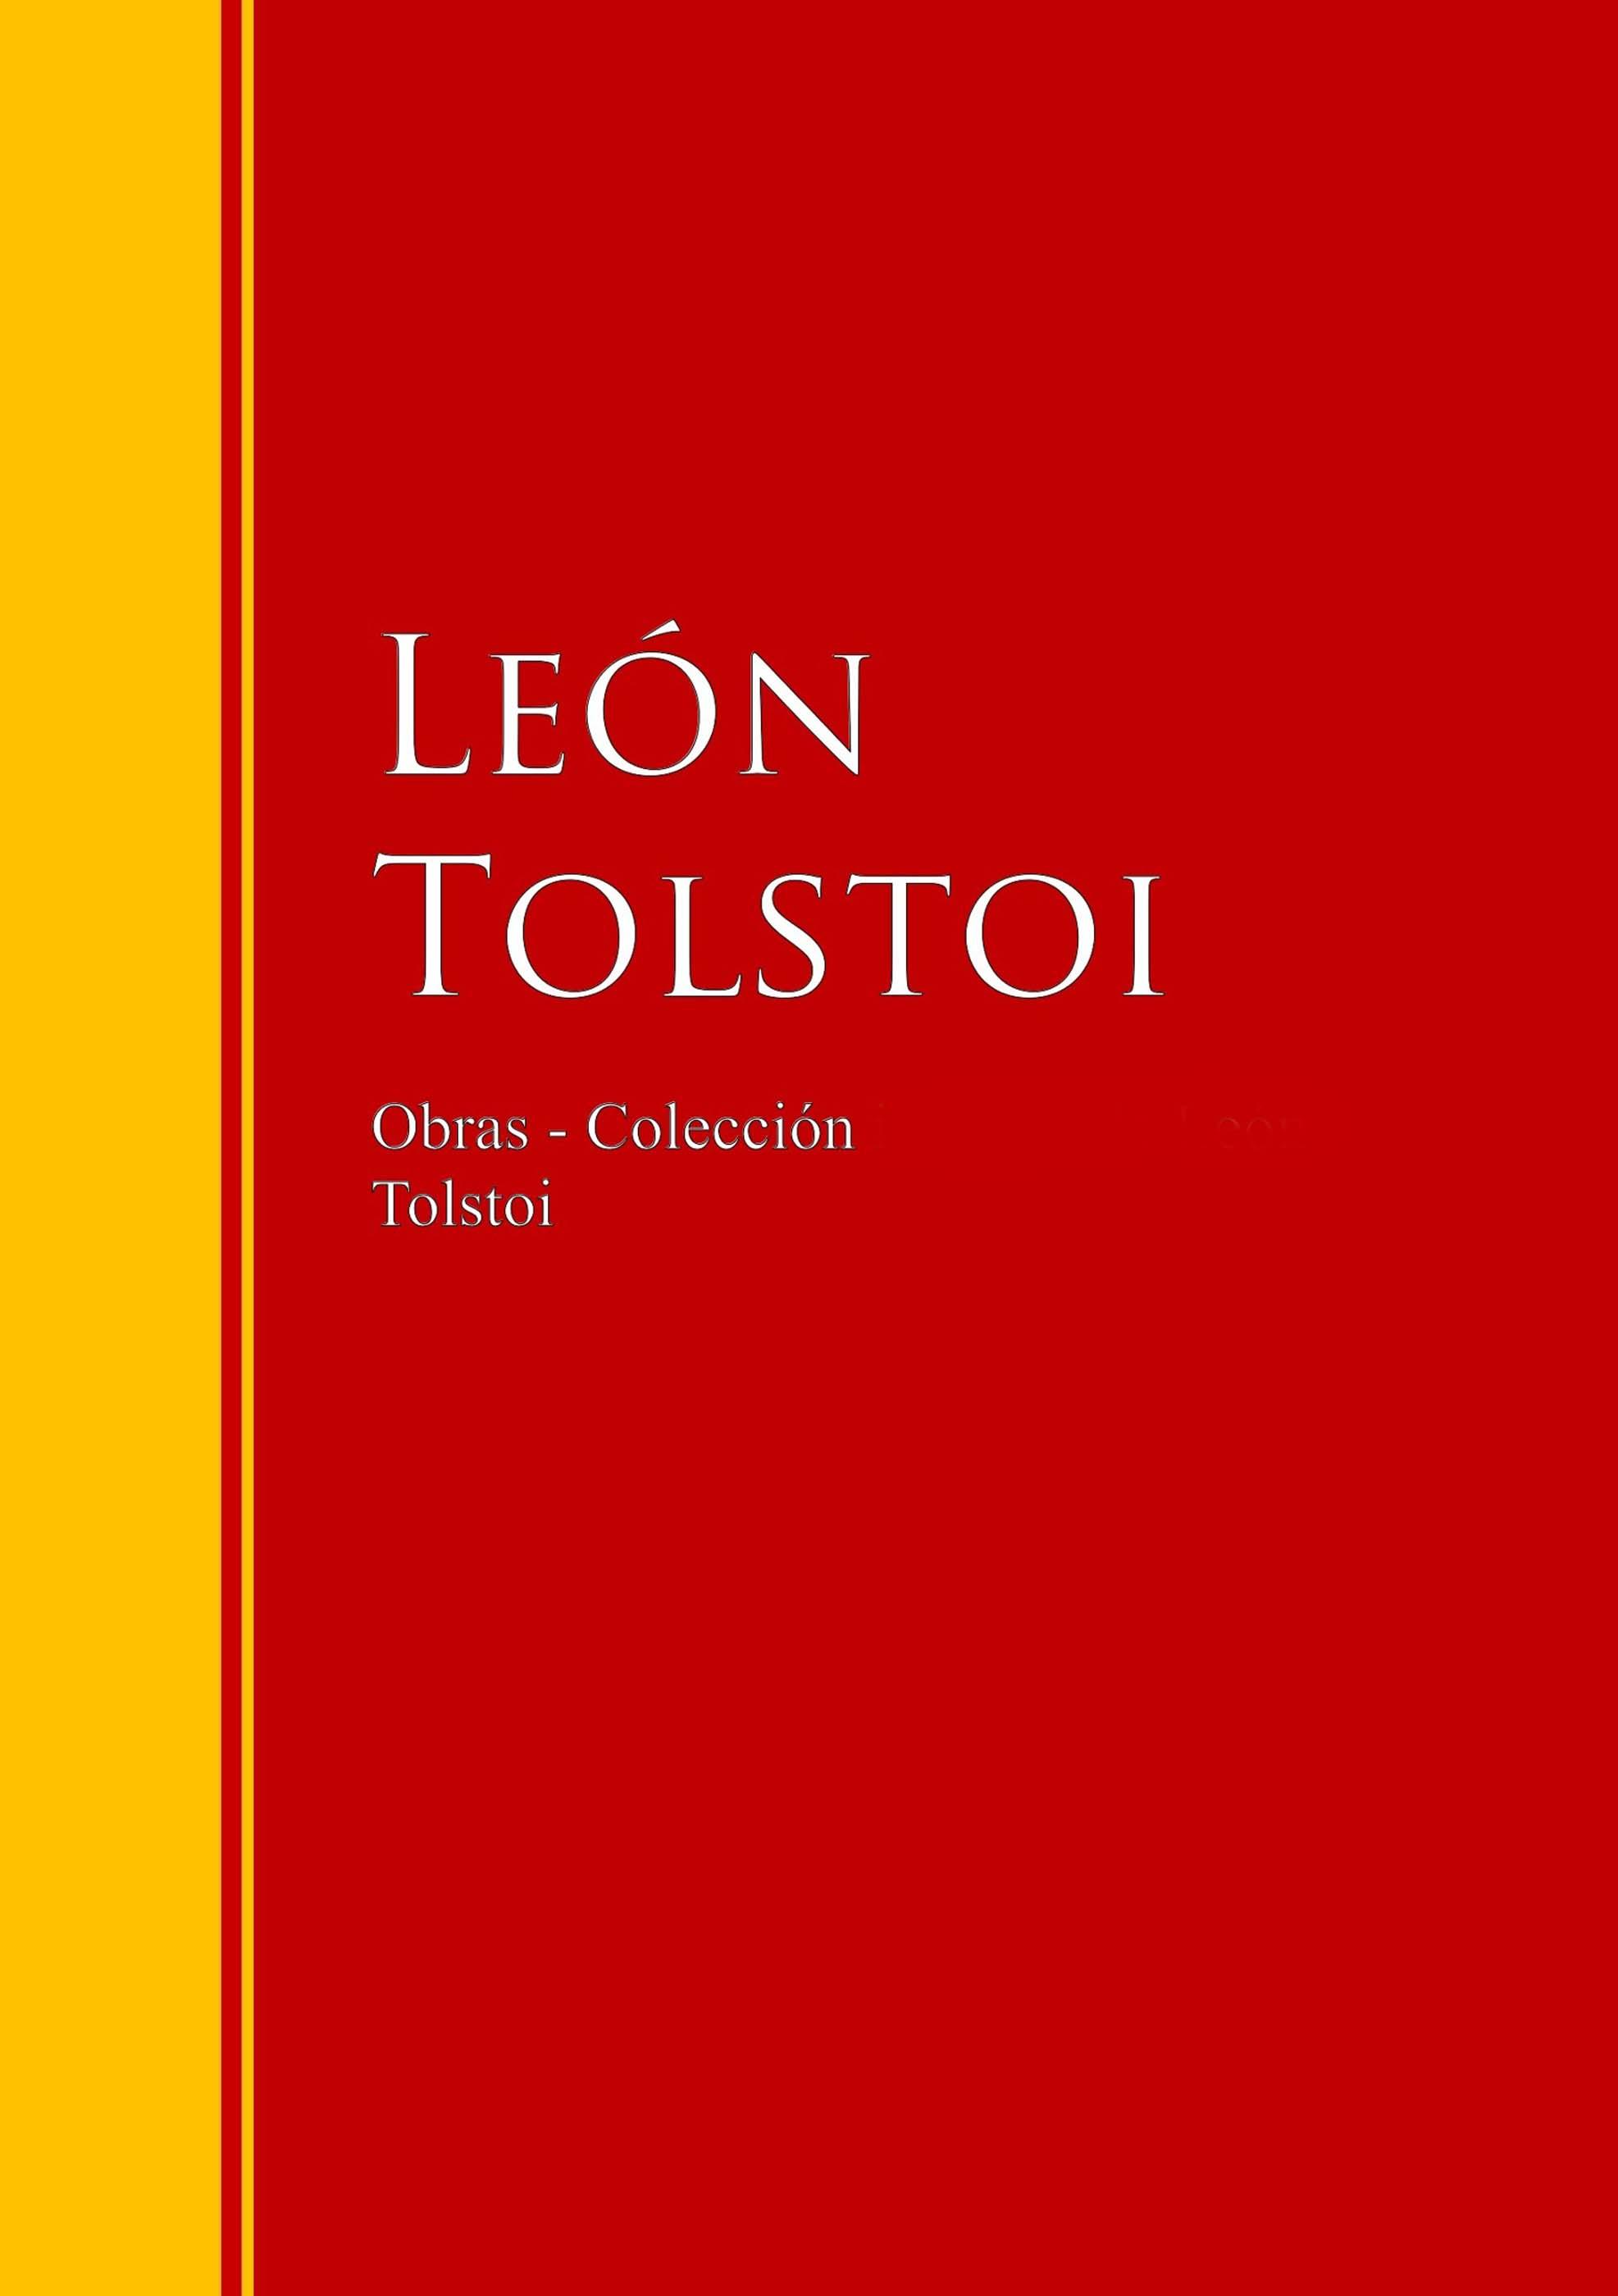 Leon Tolstoi Obras - Colección de León Tolstoi лев толстой tolstoi for the young select tales from tolstoi